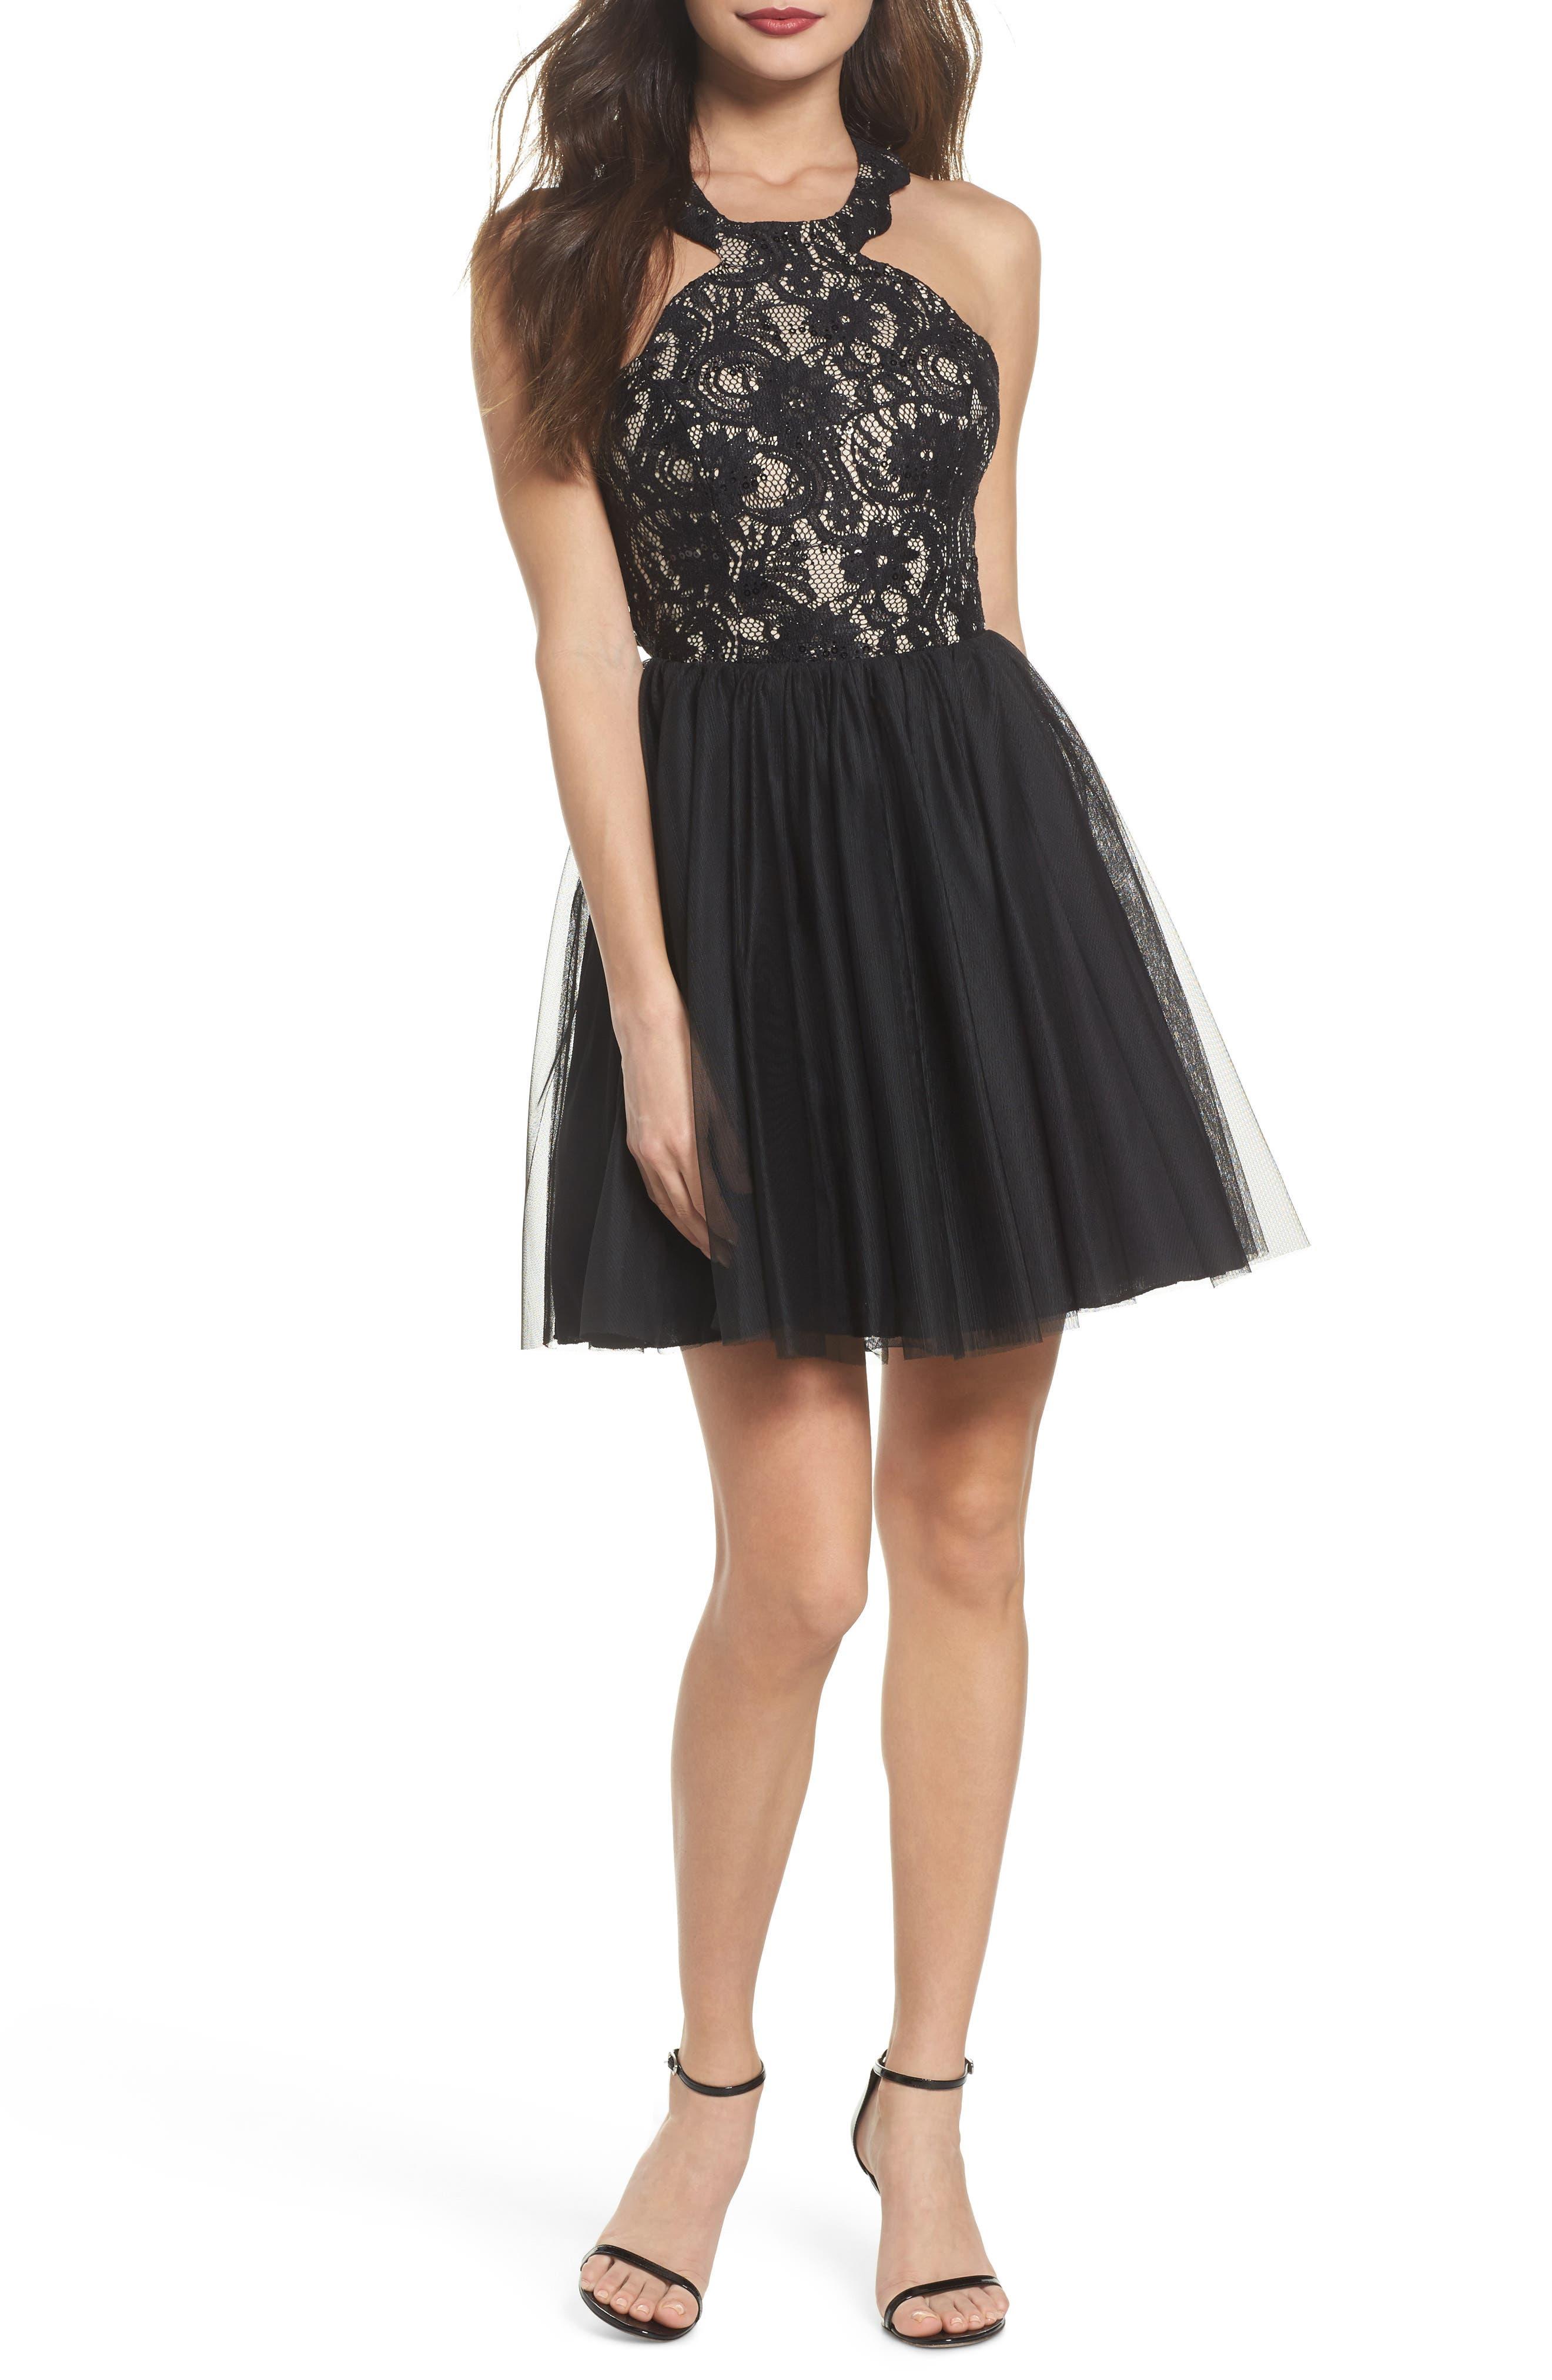 Main Image - Sequin Hearts Lace Halter Neck Dress